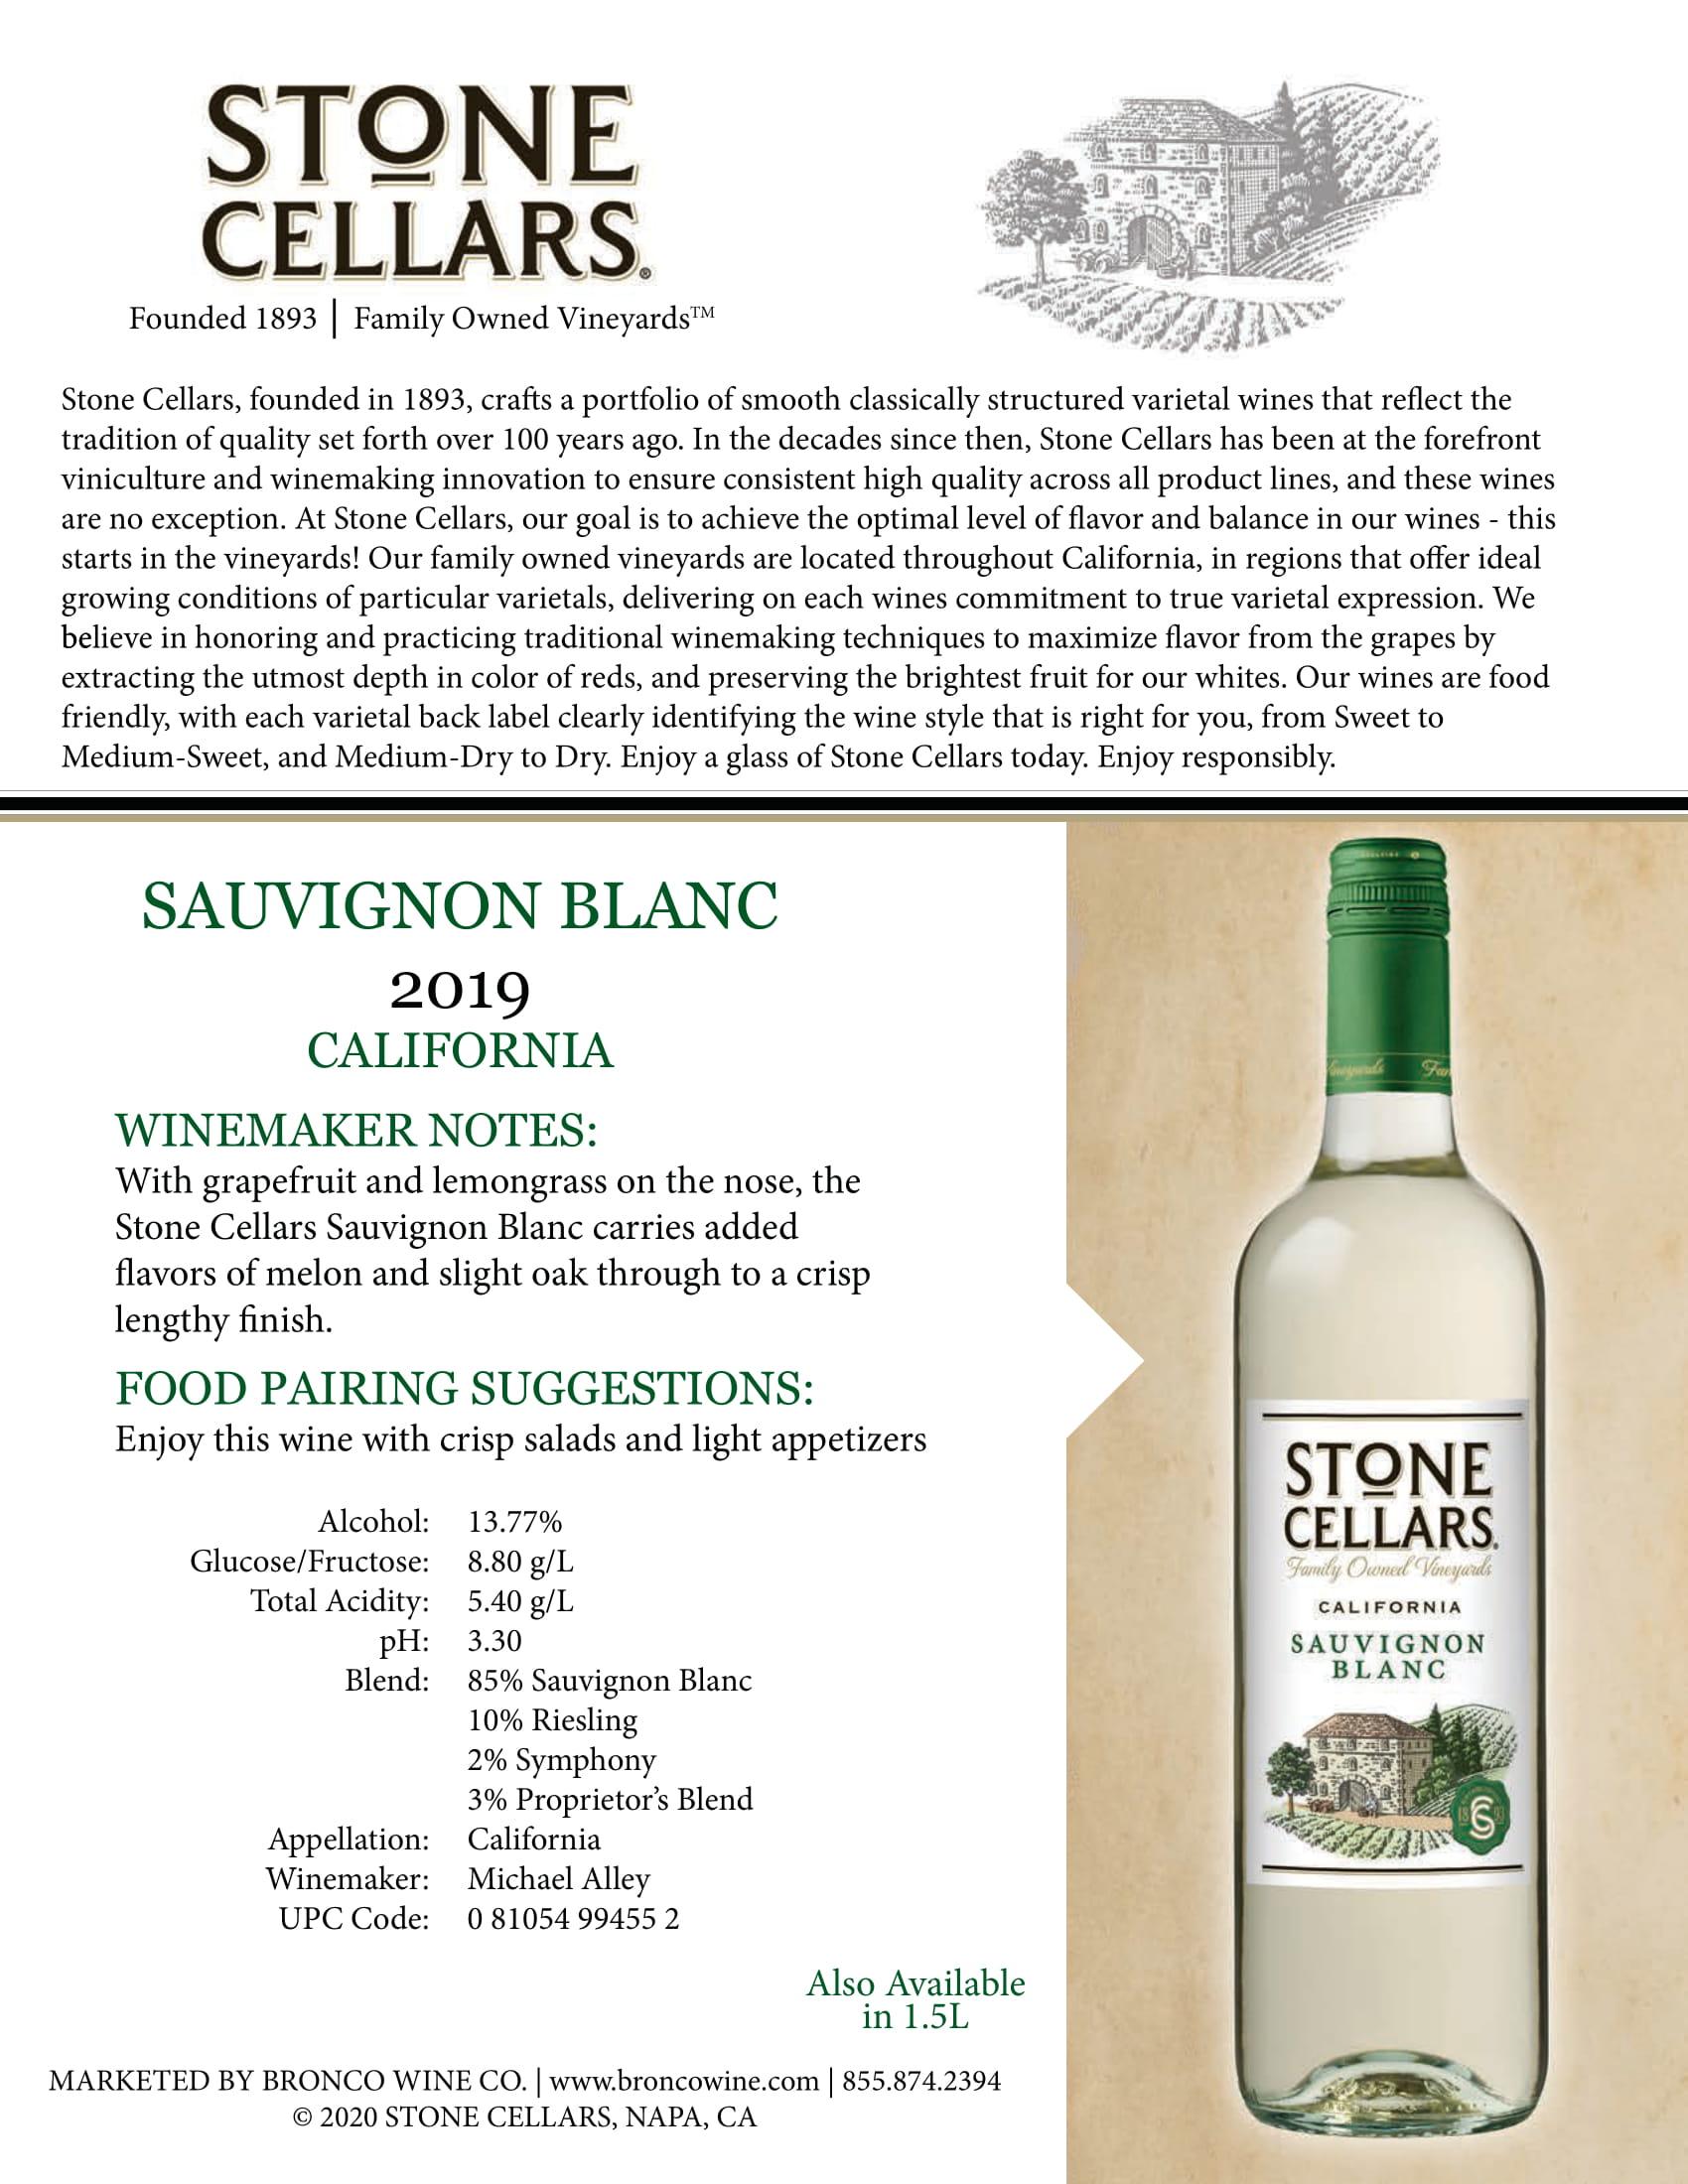 Stone Cellars Sauvignon Blanc Tech Sheet